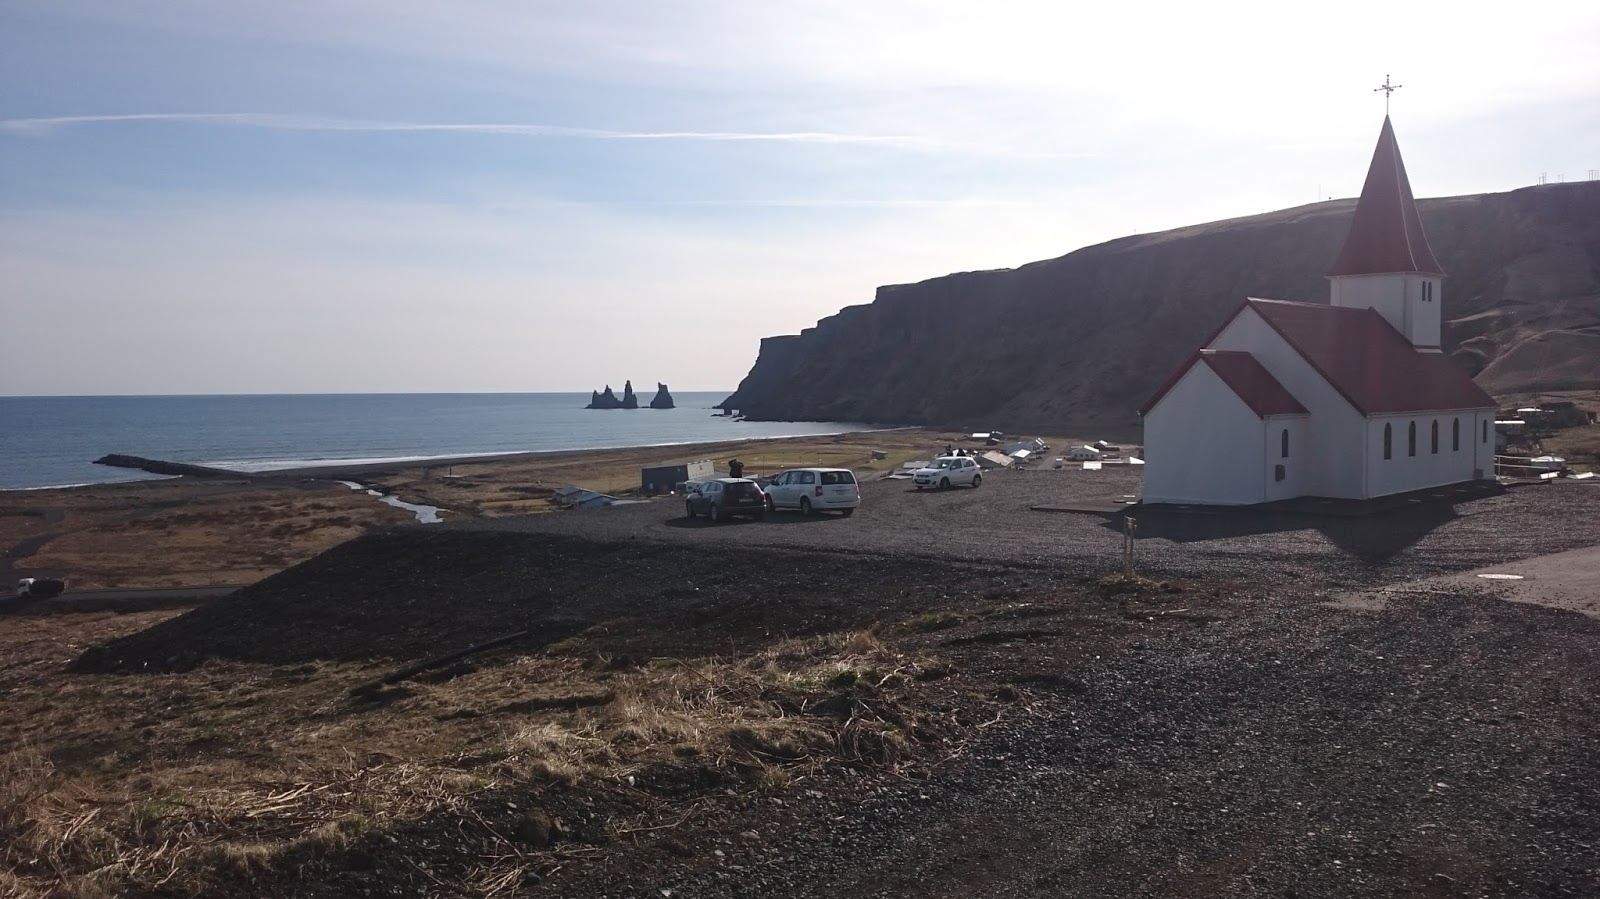 panorama Viku, miasteczko Vik, islandzkie miasteczko, Islandia